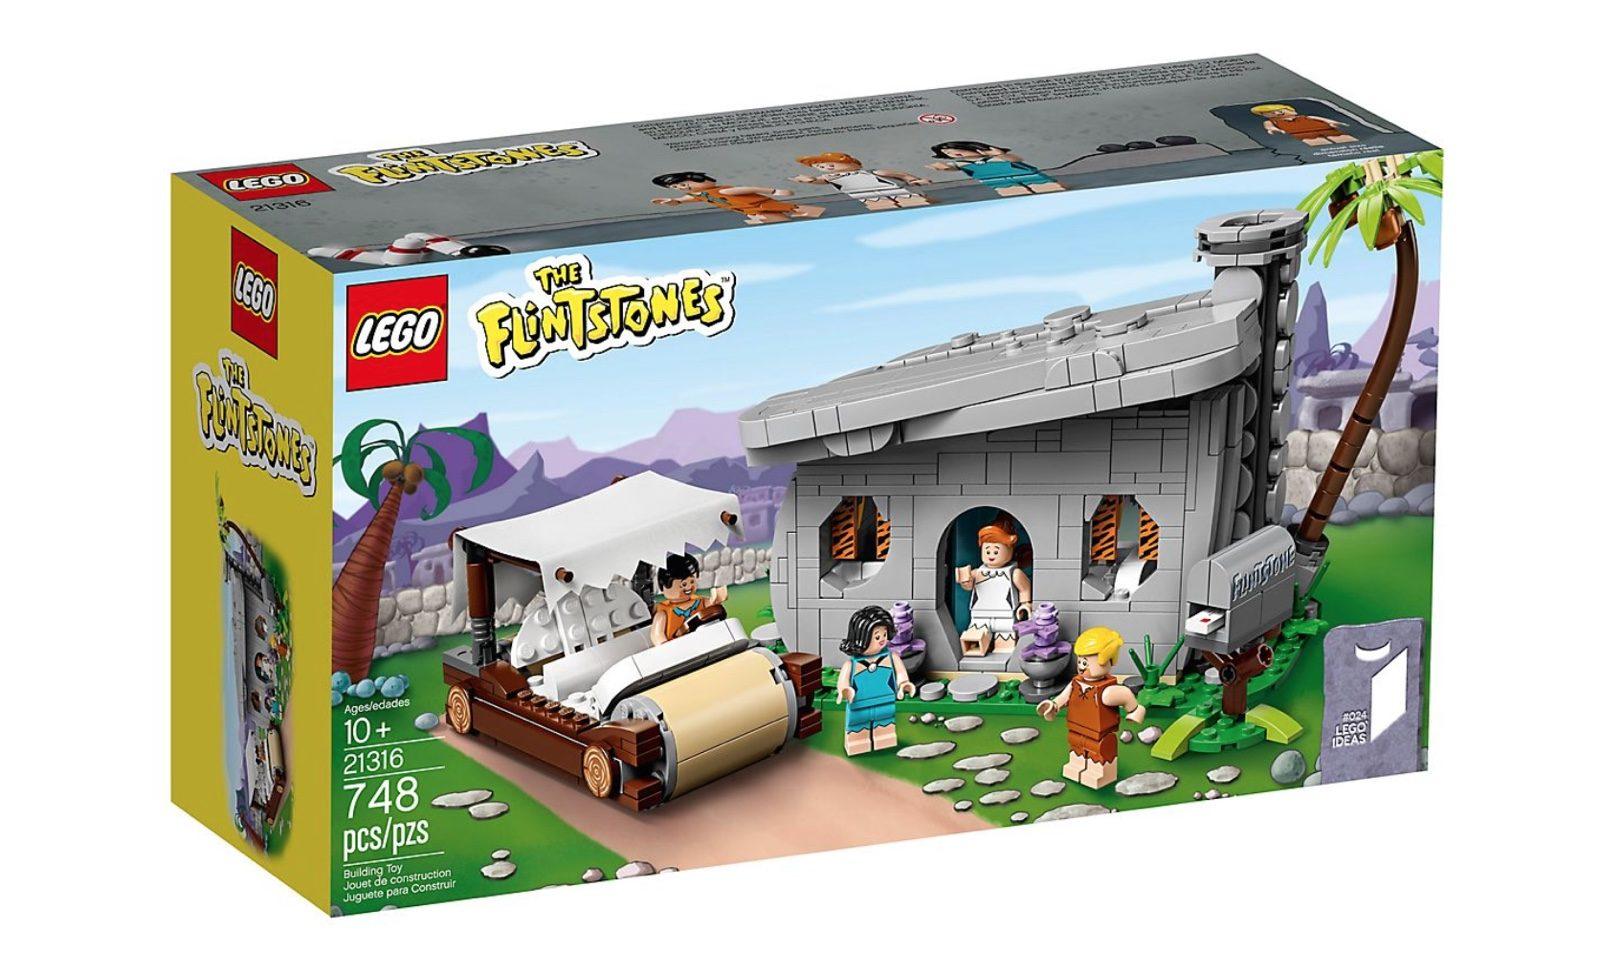 Yabba Dabba Doo! The LEGO Flintstones Set Releases February 20th